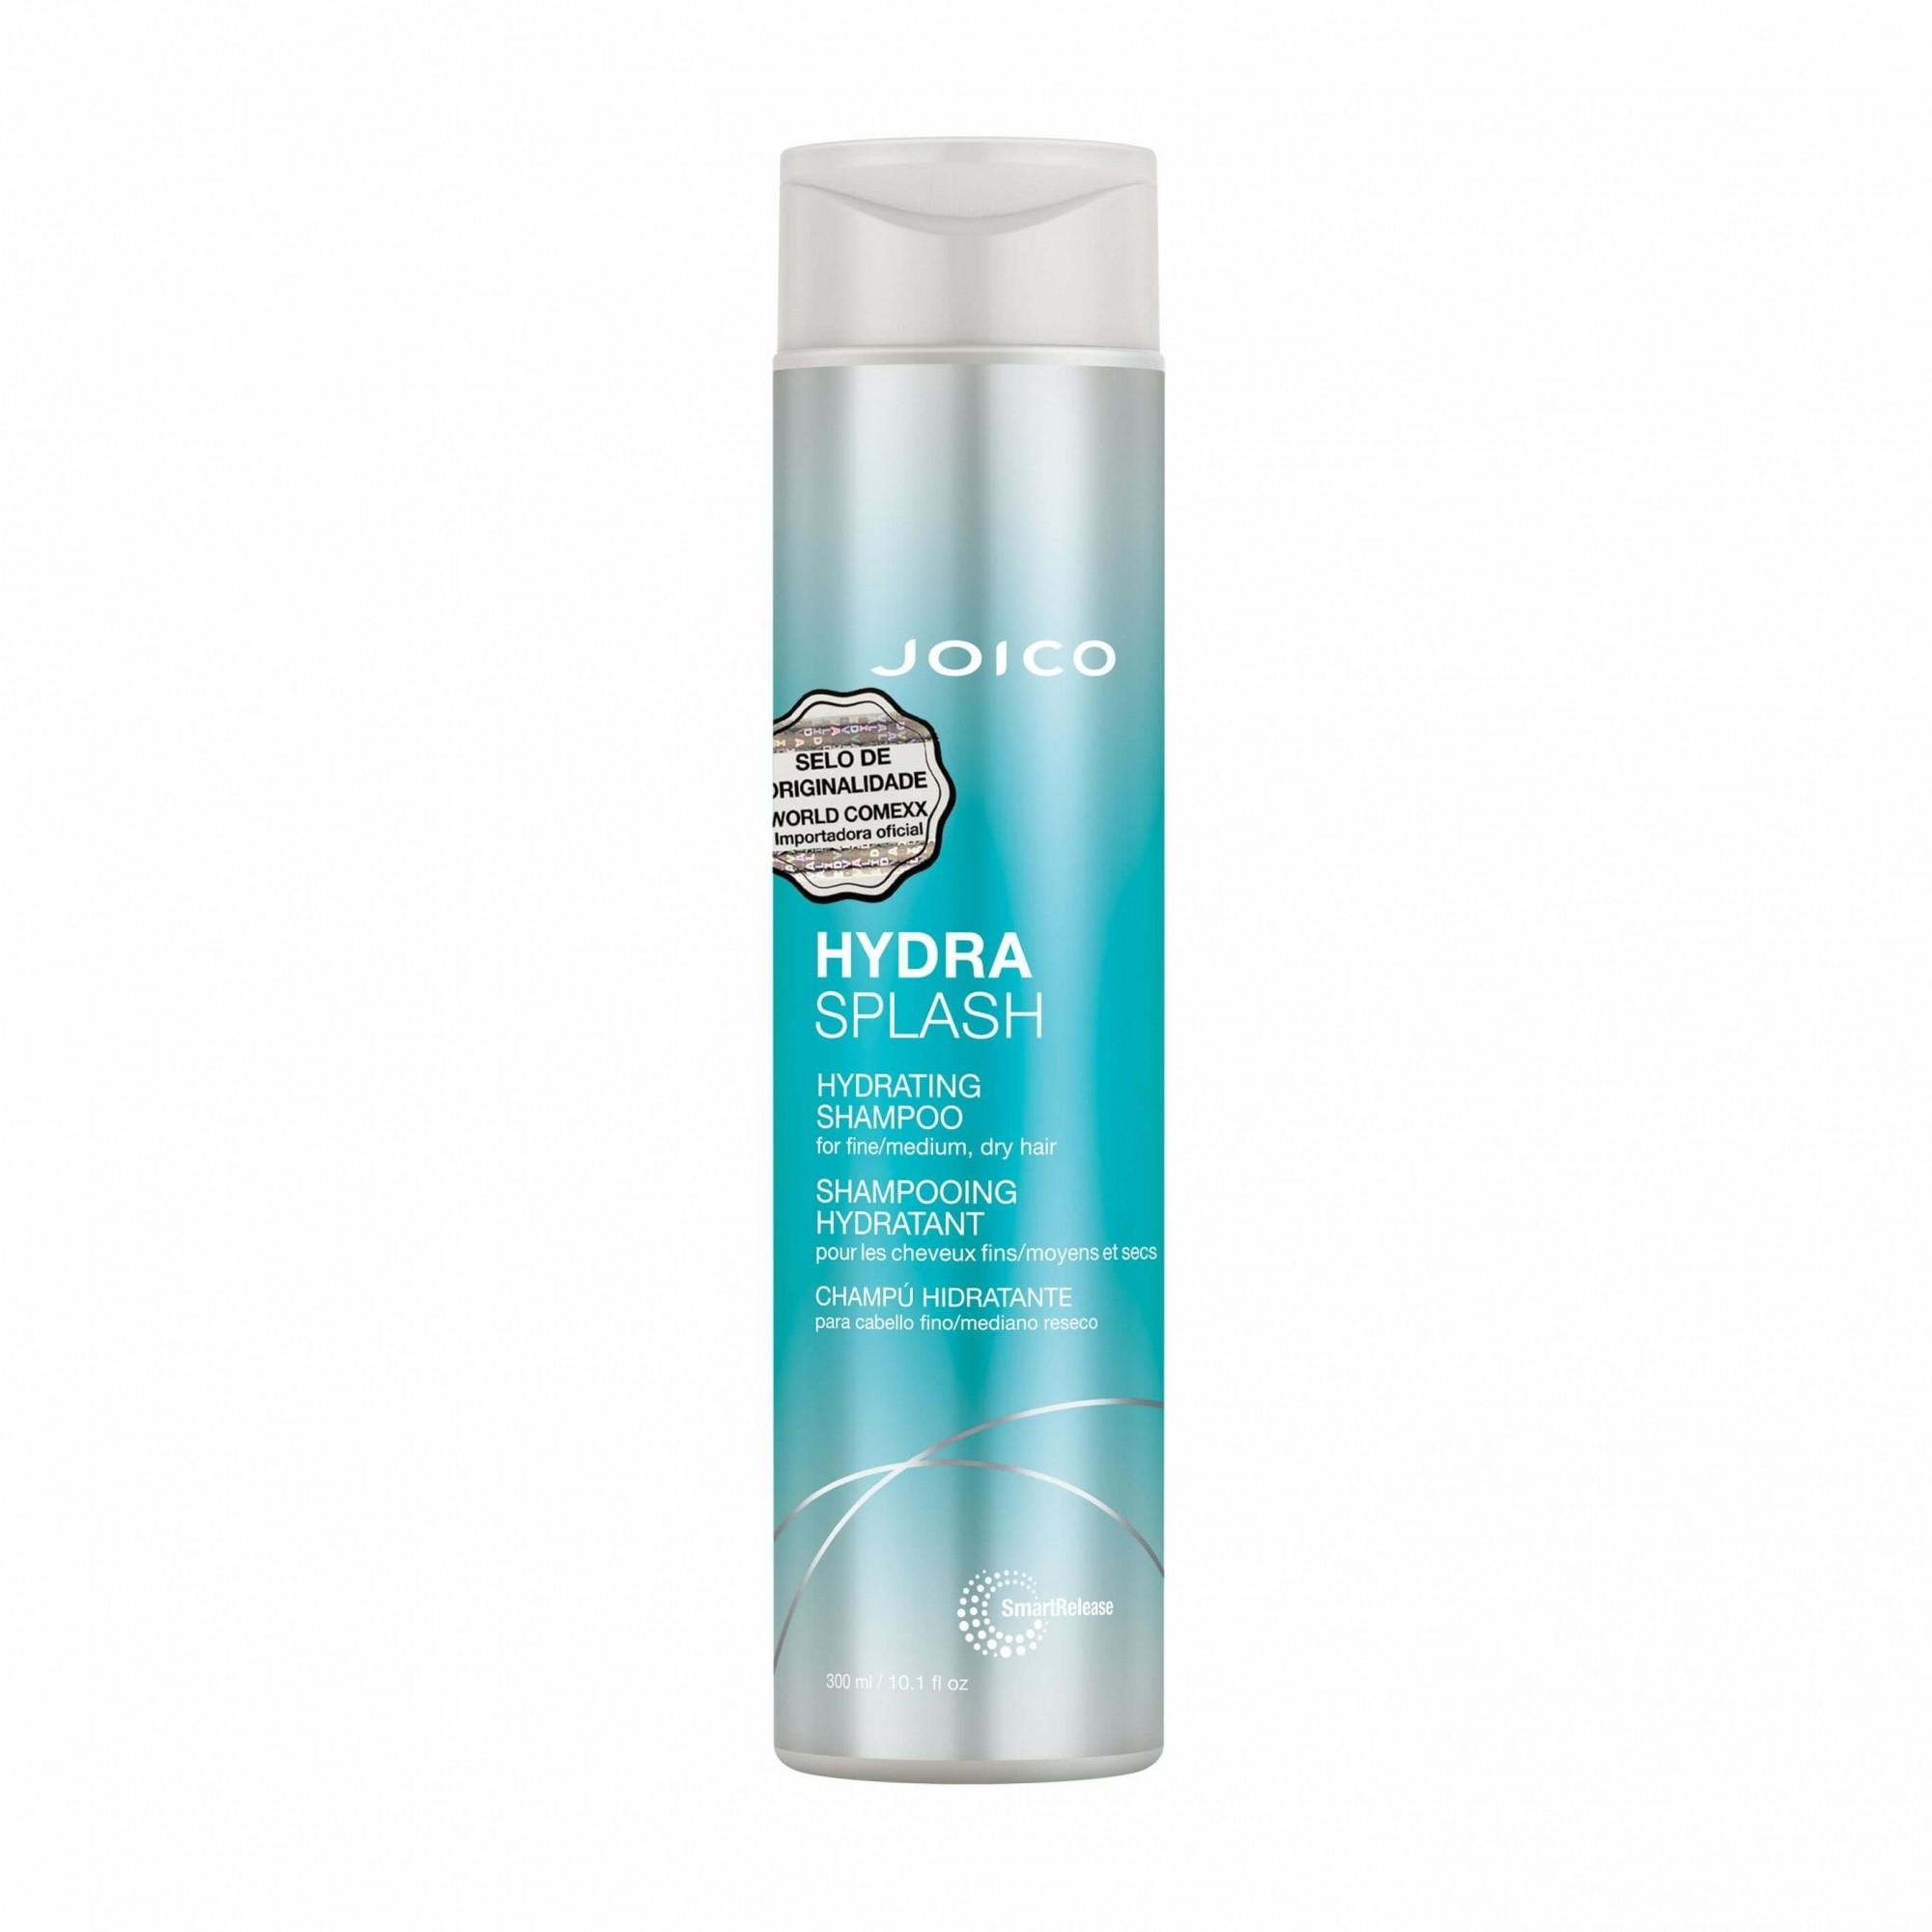 Shampoo Hydra Splash Joico 300ml